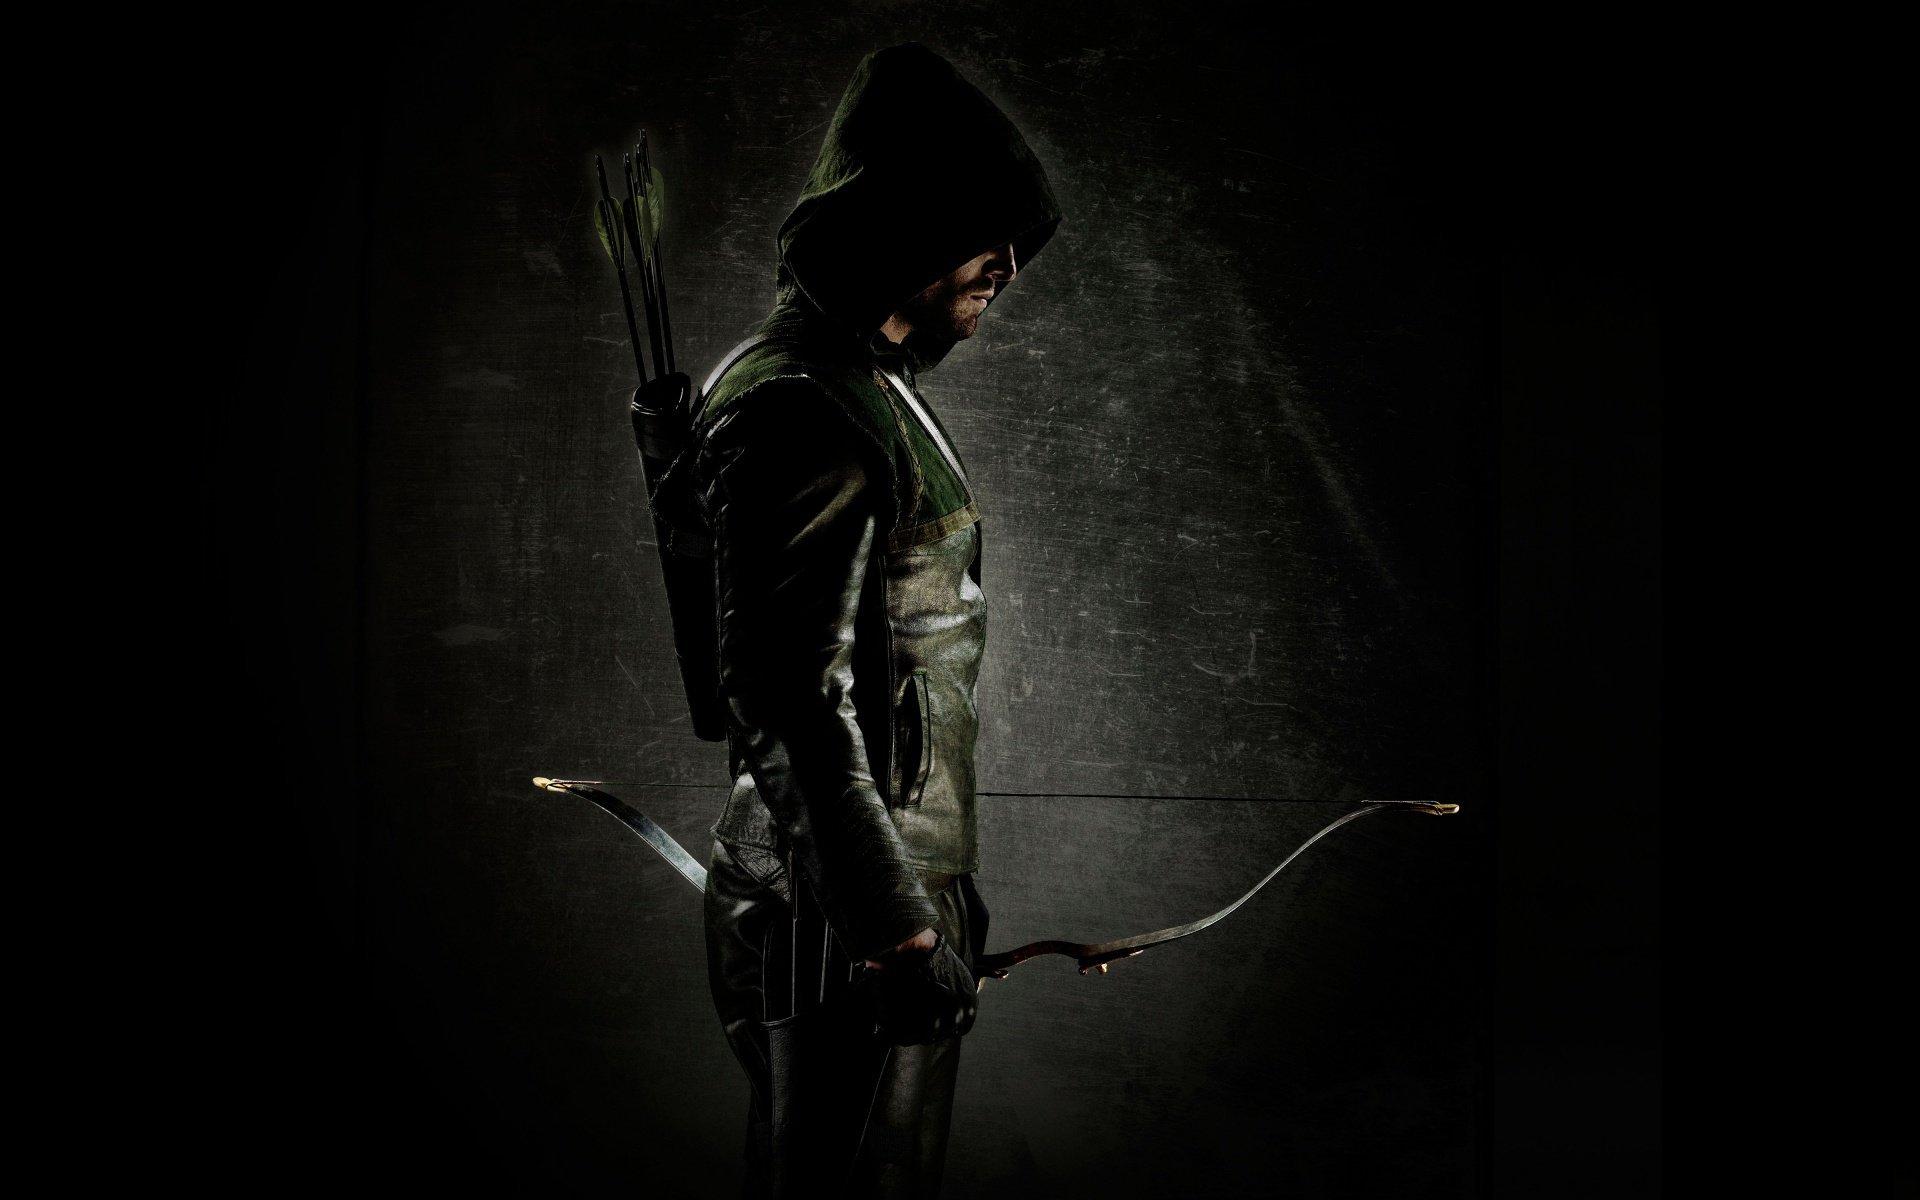 воин лучник, стрелок, боец, лук, рисунок